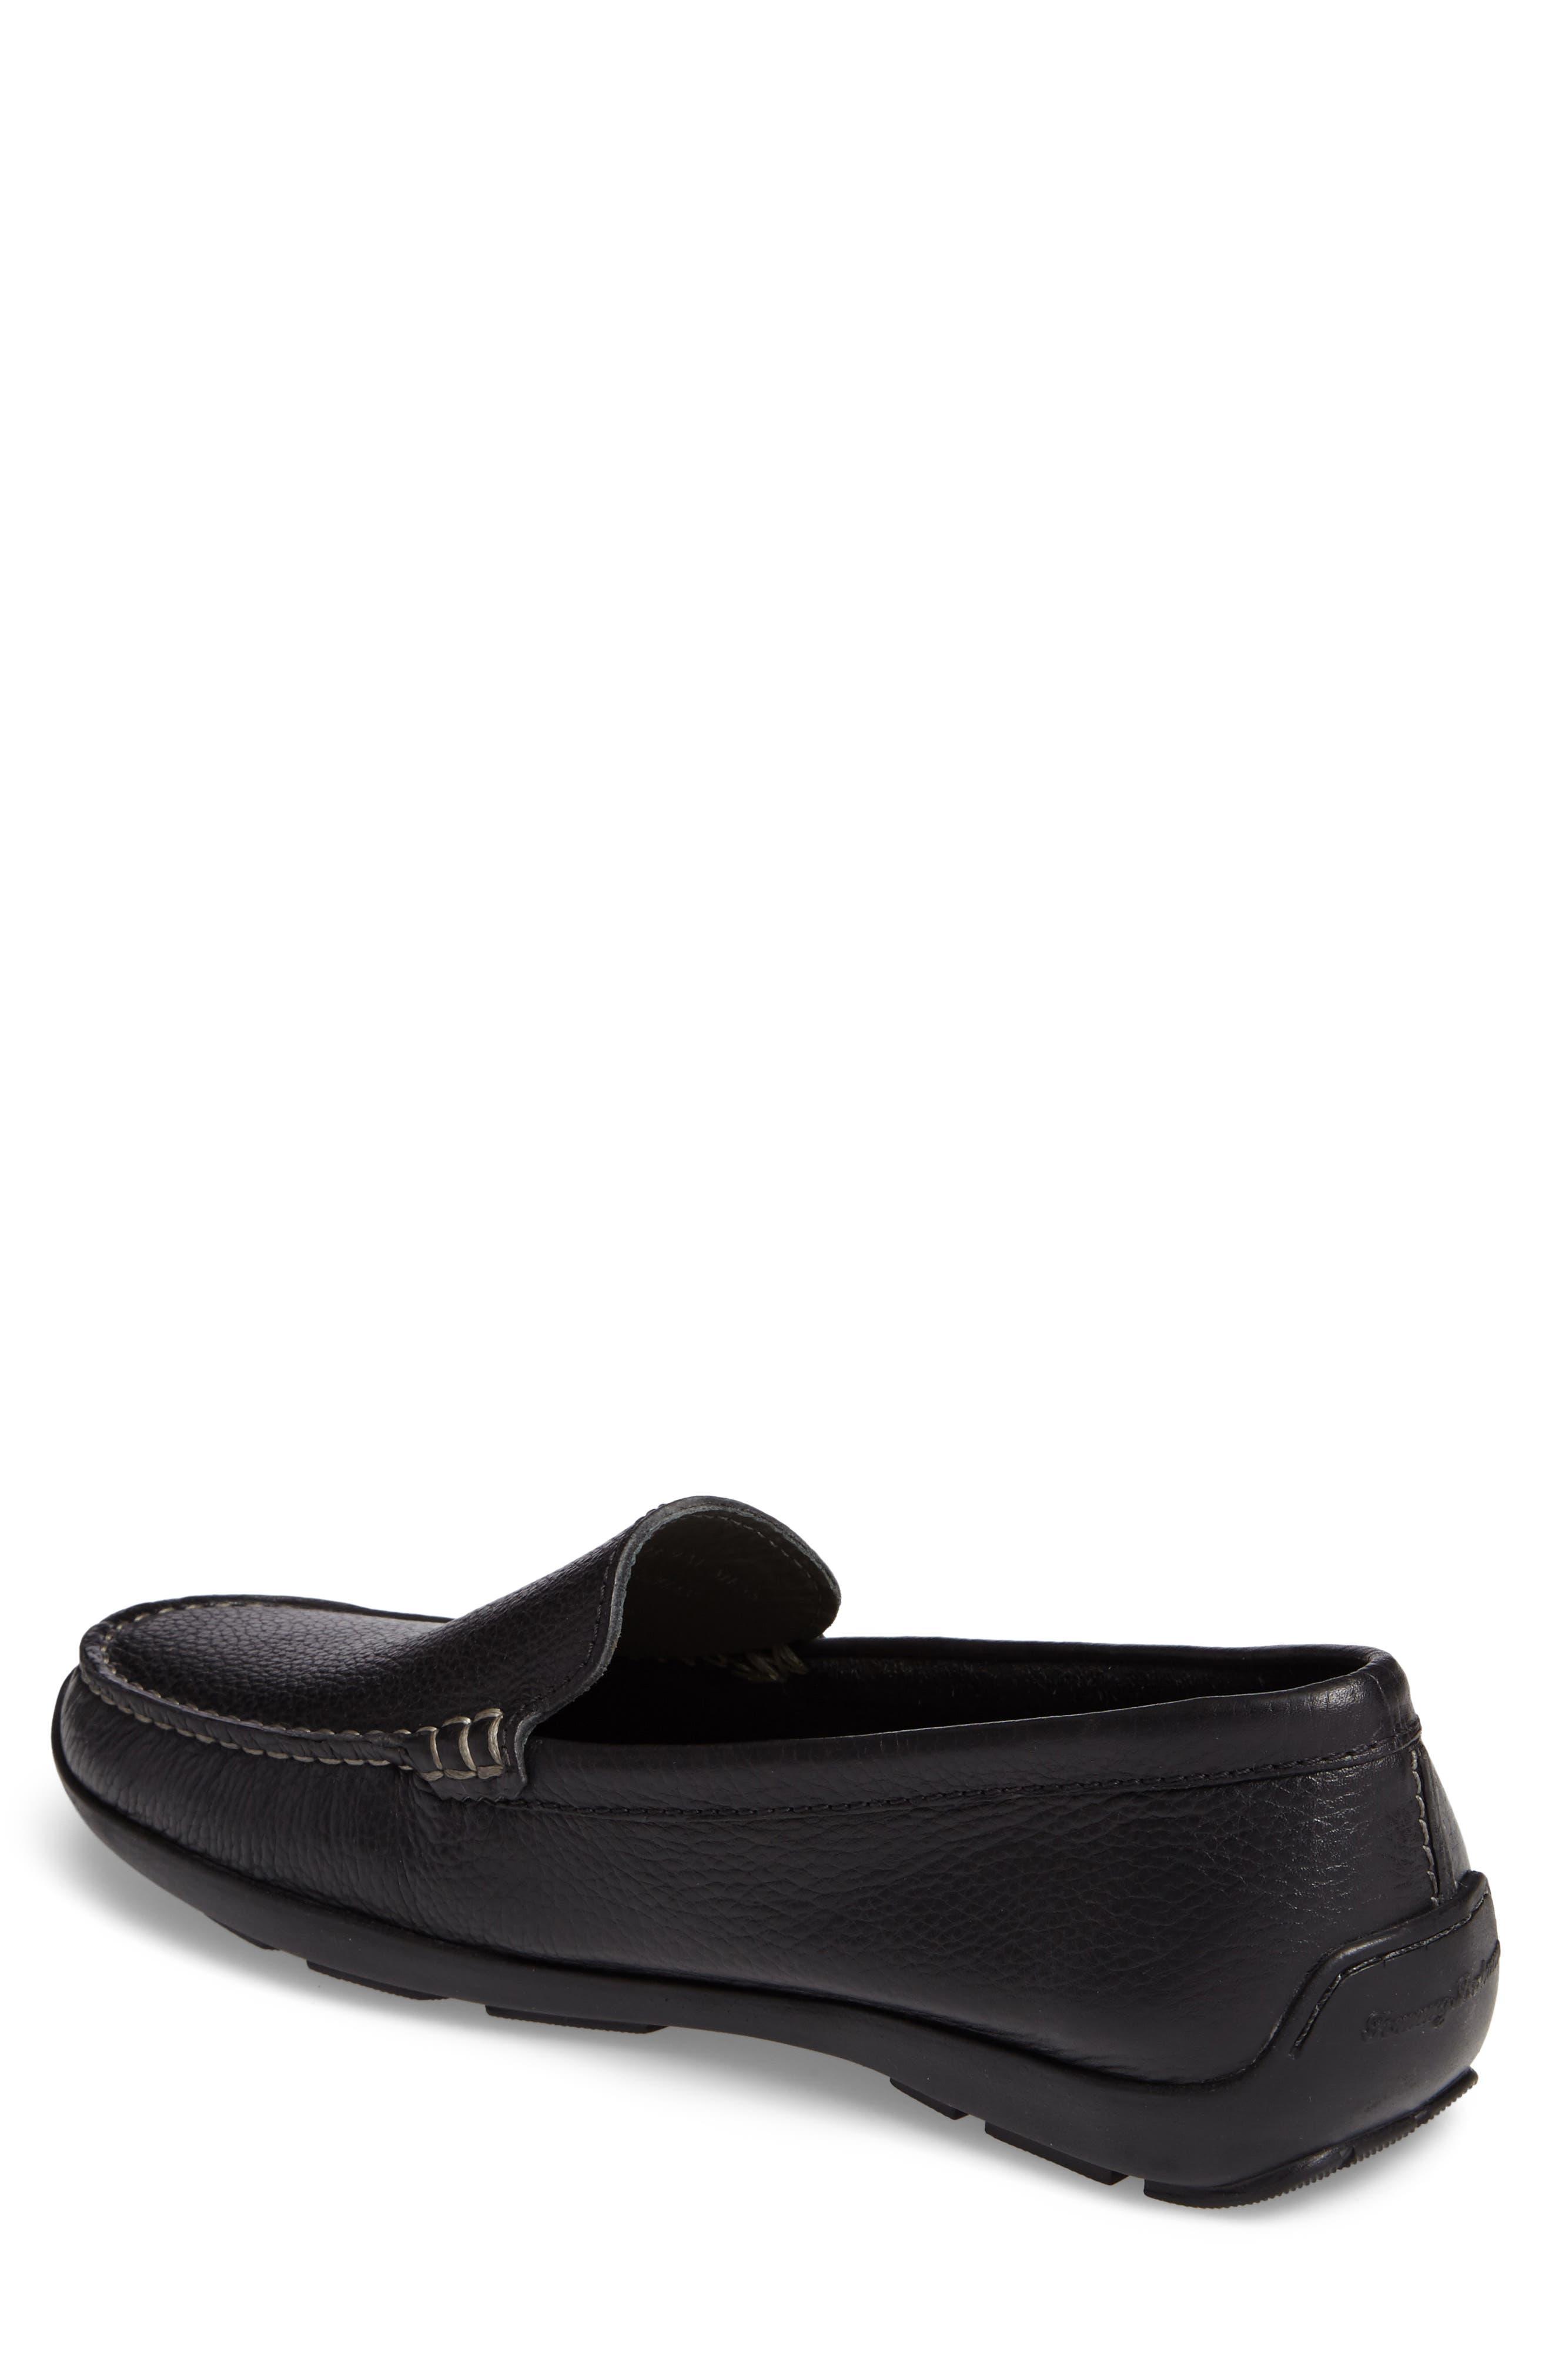 Orion Venetian Loafer,                             Alternate thumbnail 2, color,                             Black Leather